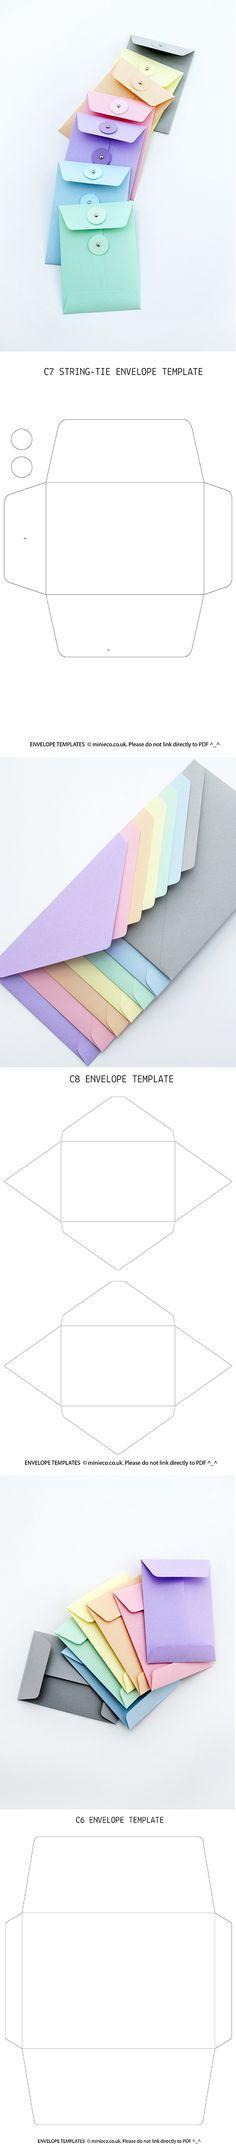 Free Envelope Templates (C6, C7, C8)  String-tie & standard designs